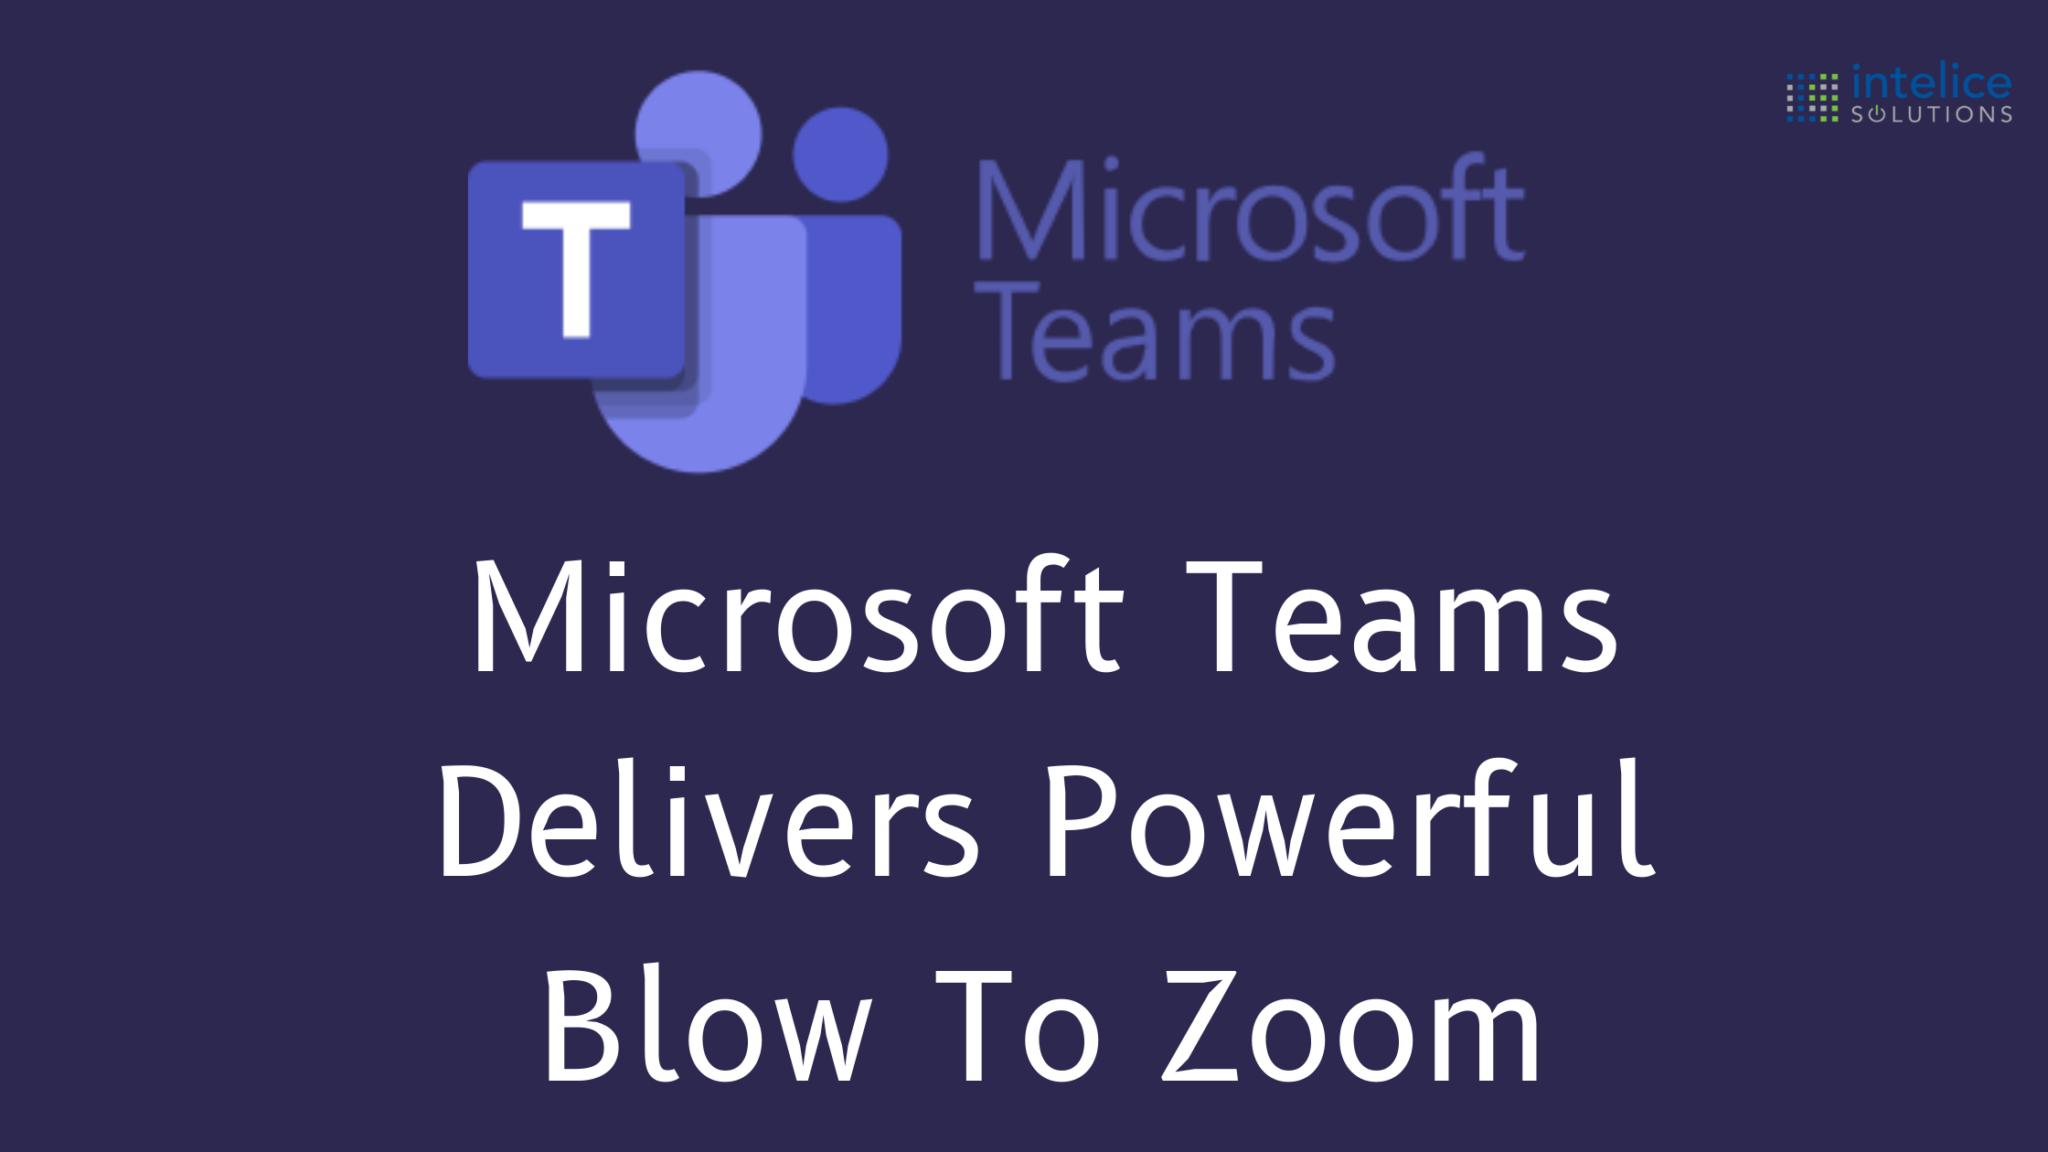 Microsoft Teams and Zoom